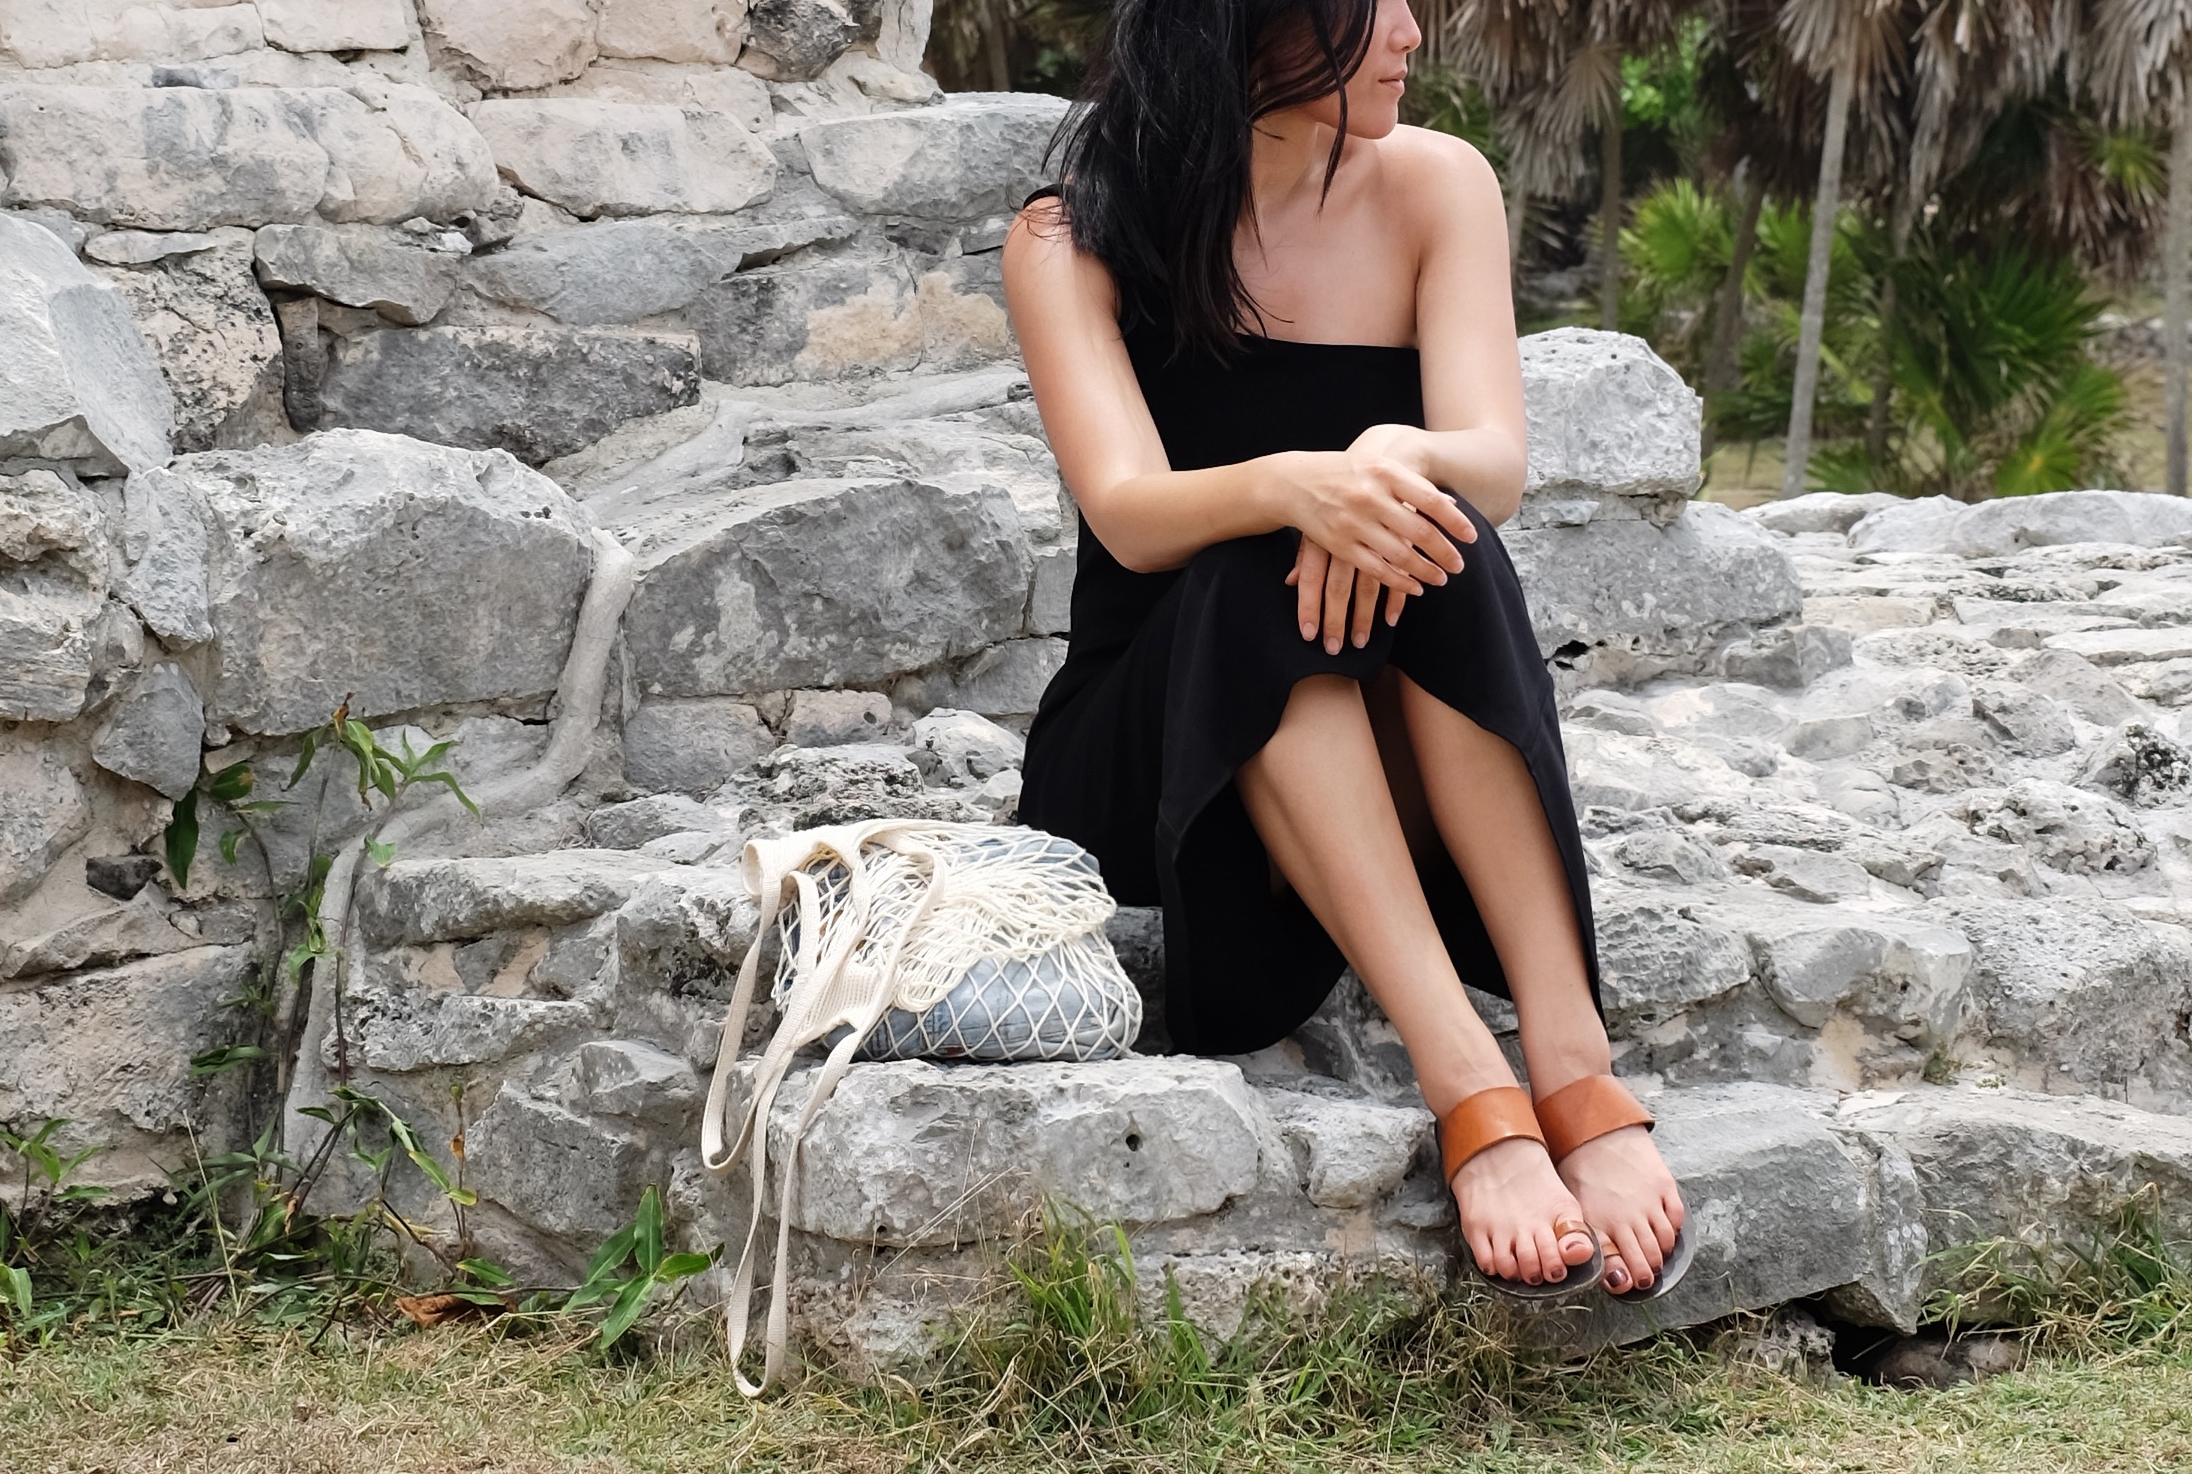 TOTÊME   Dress  (More   here  ) / ATP ATELIER   Sandals  (Similar   here  and   here  ) / FILT   Net Bag  (Similar   here  )